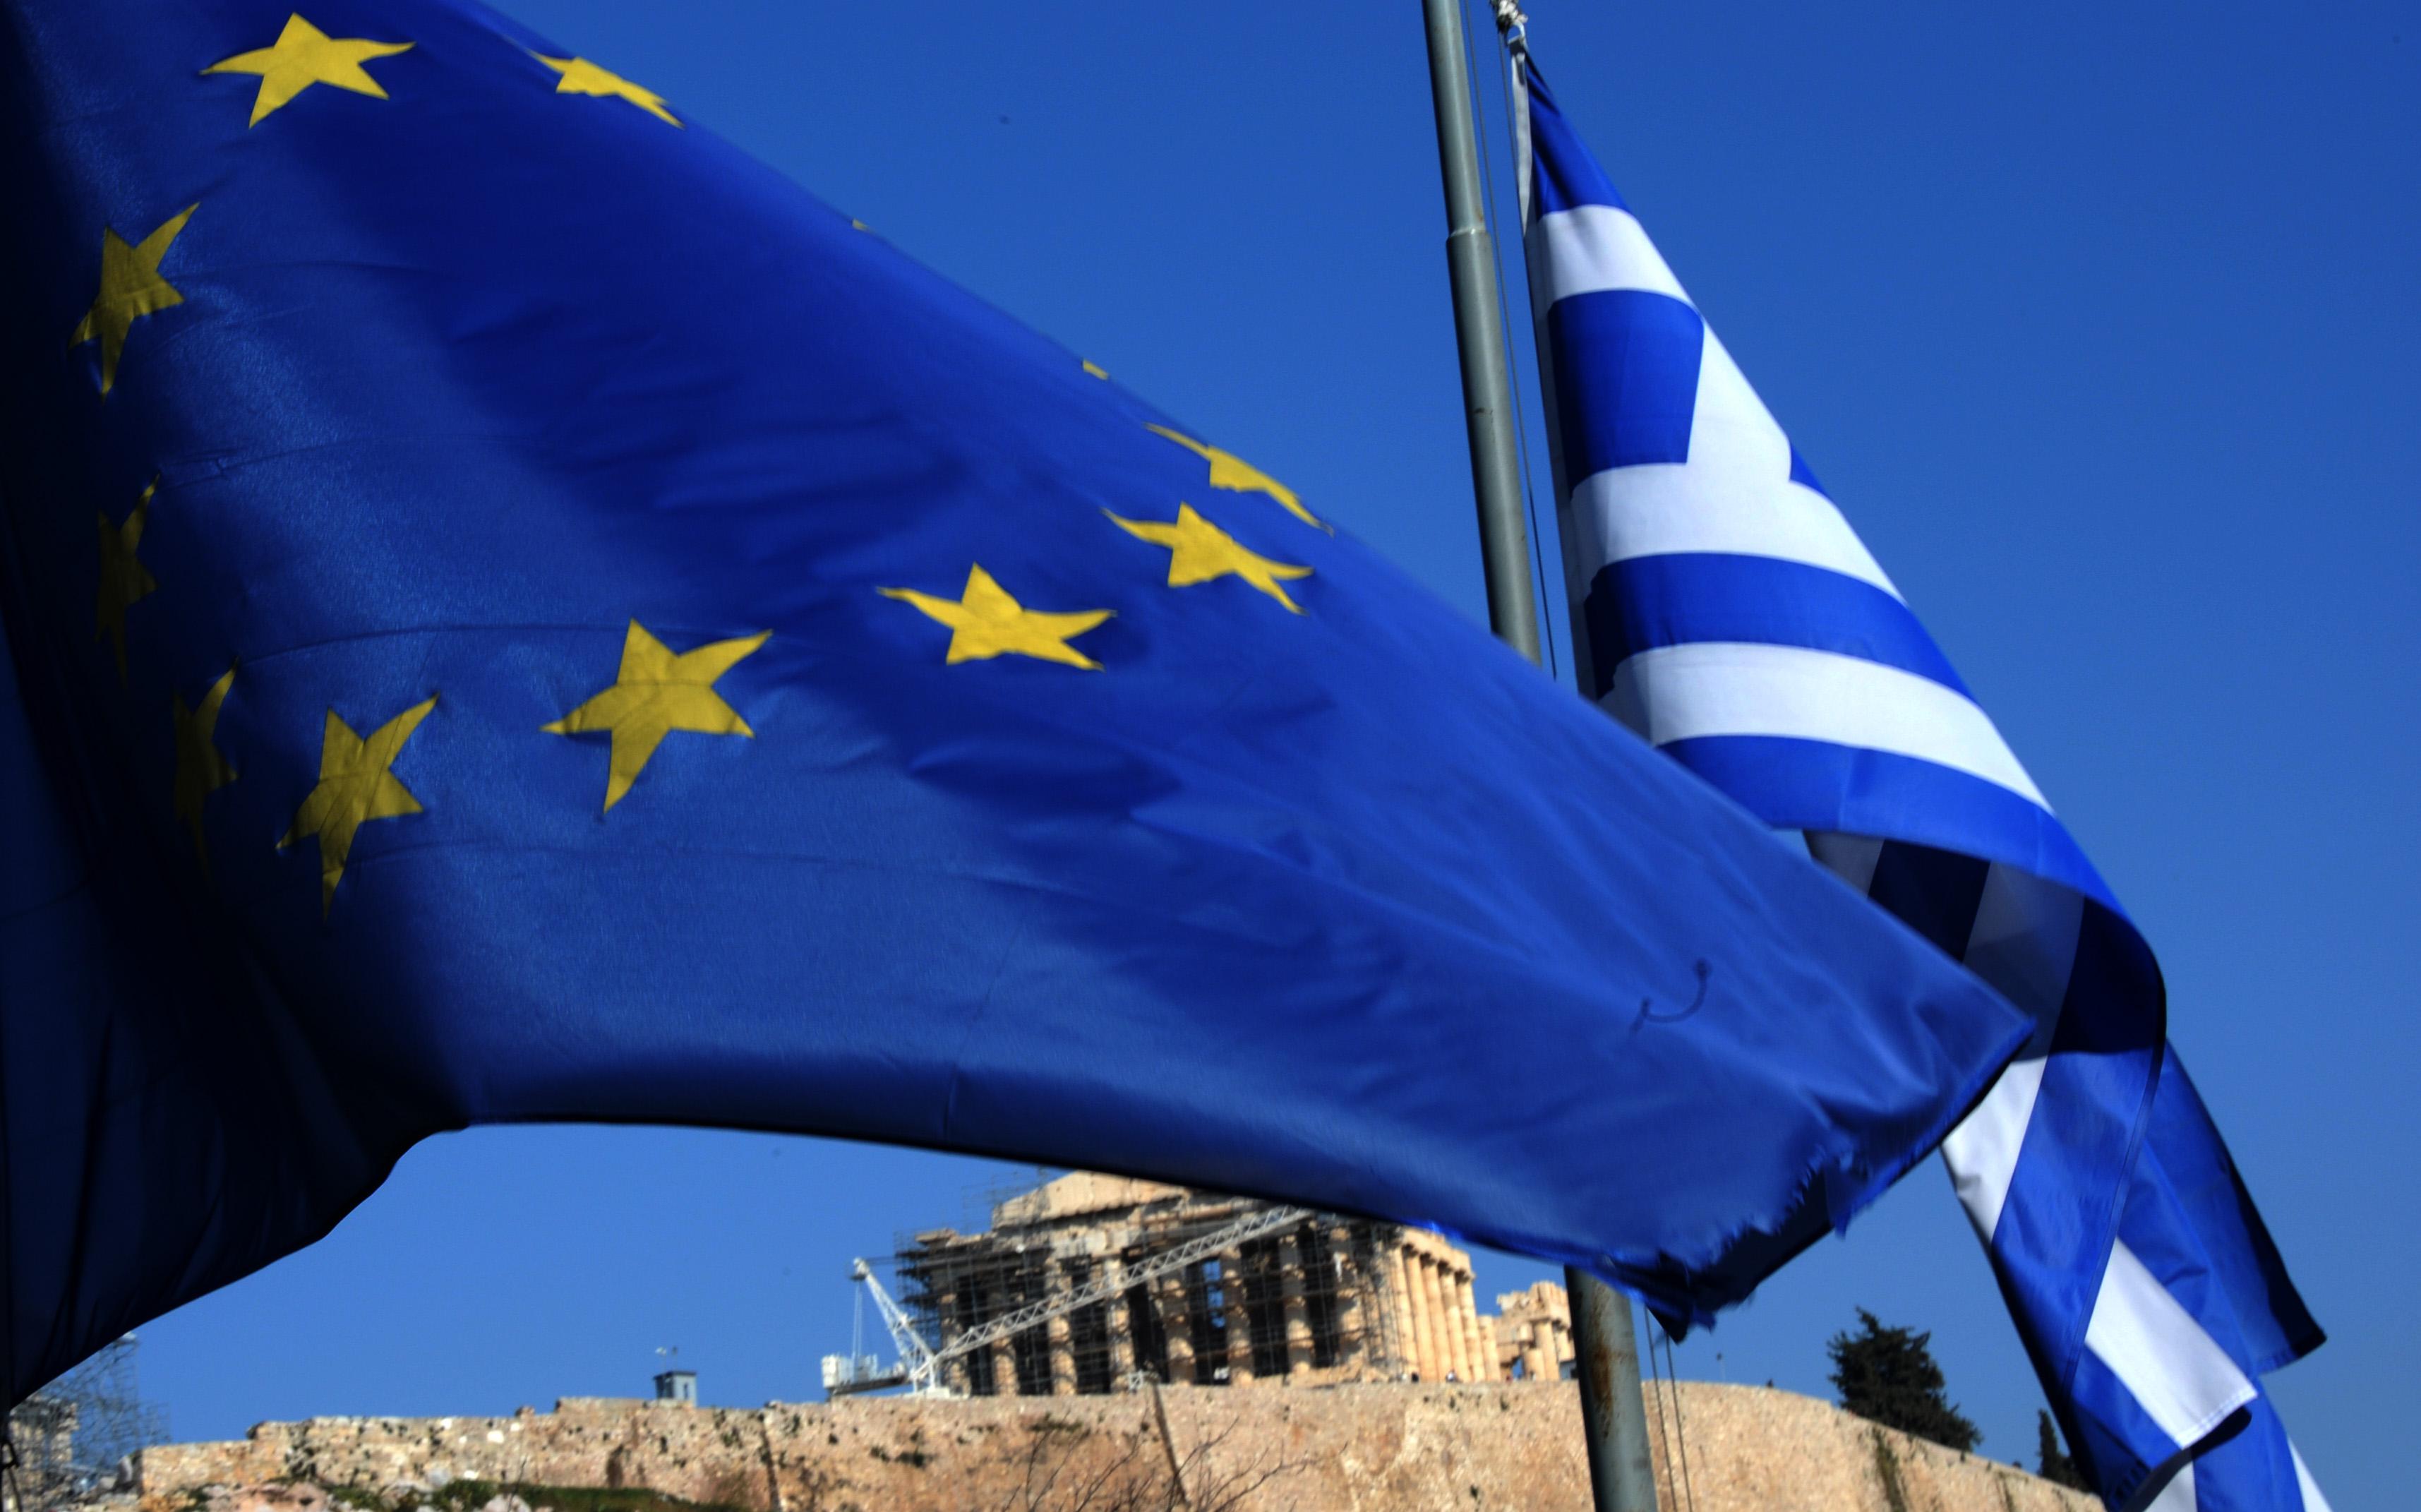 Bloomberg: Συντάξεις, πρωτογενές, ΦΠΑ, παραμένουν ανοικτά | tovima.gr